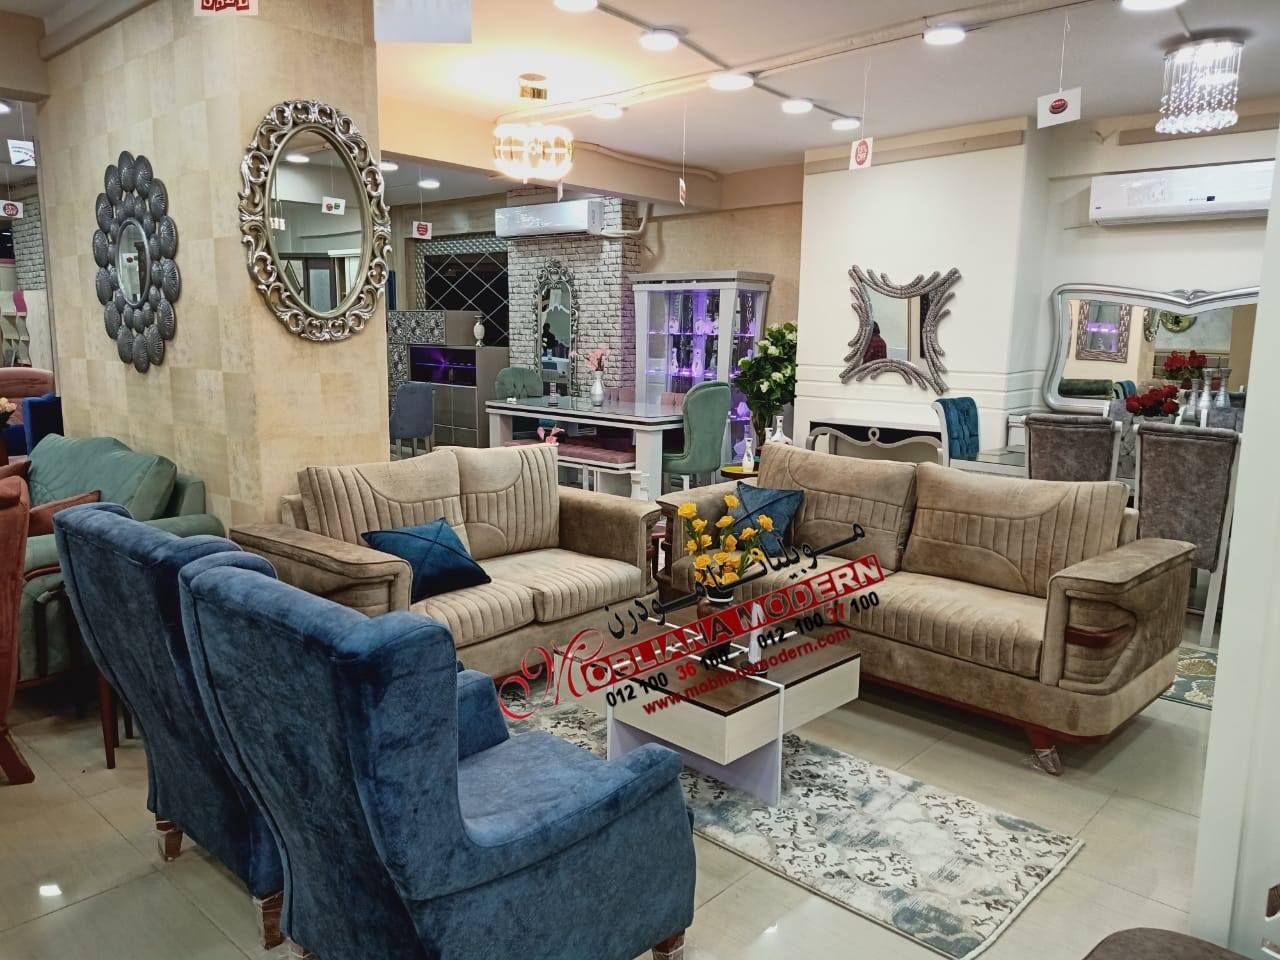 صور احدث موديلات الانتريهات 2021 Living Room 2020 Colorful Eclectic Living Room Living Room Eclectic Living Room